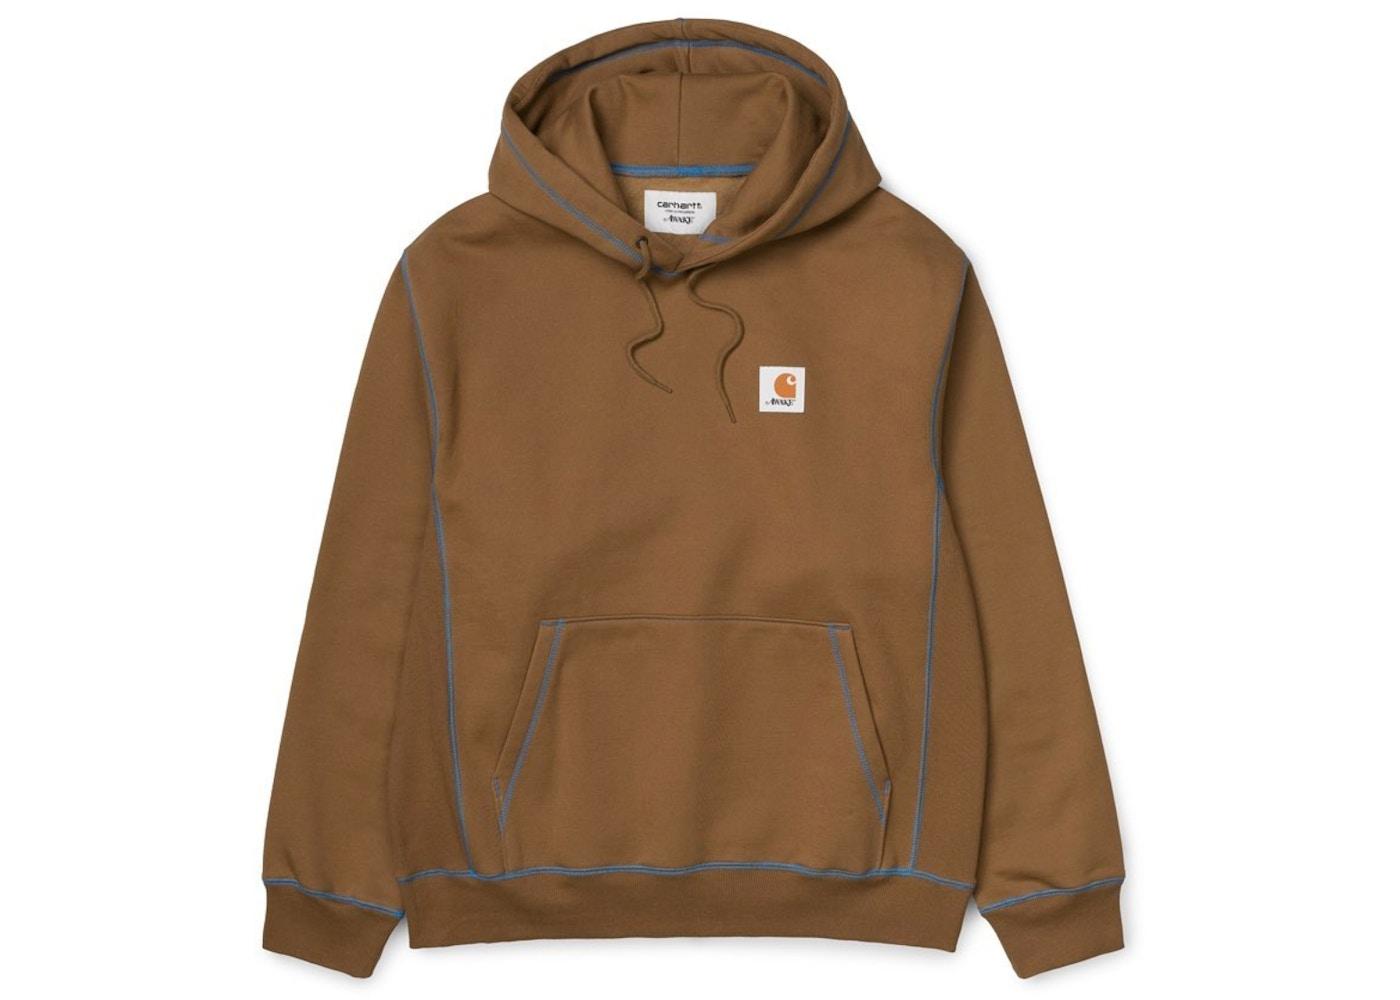 carhartt x nike hoodie